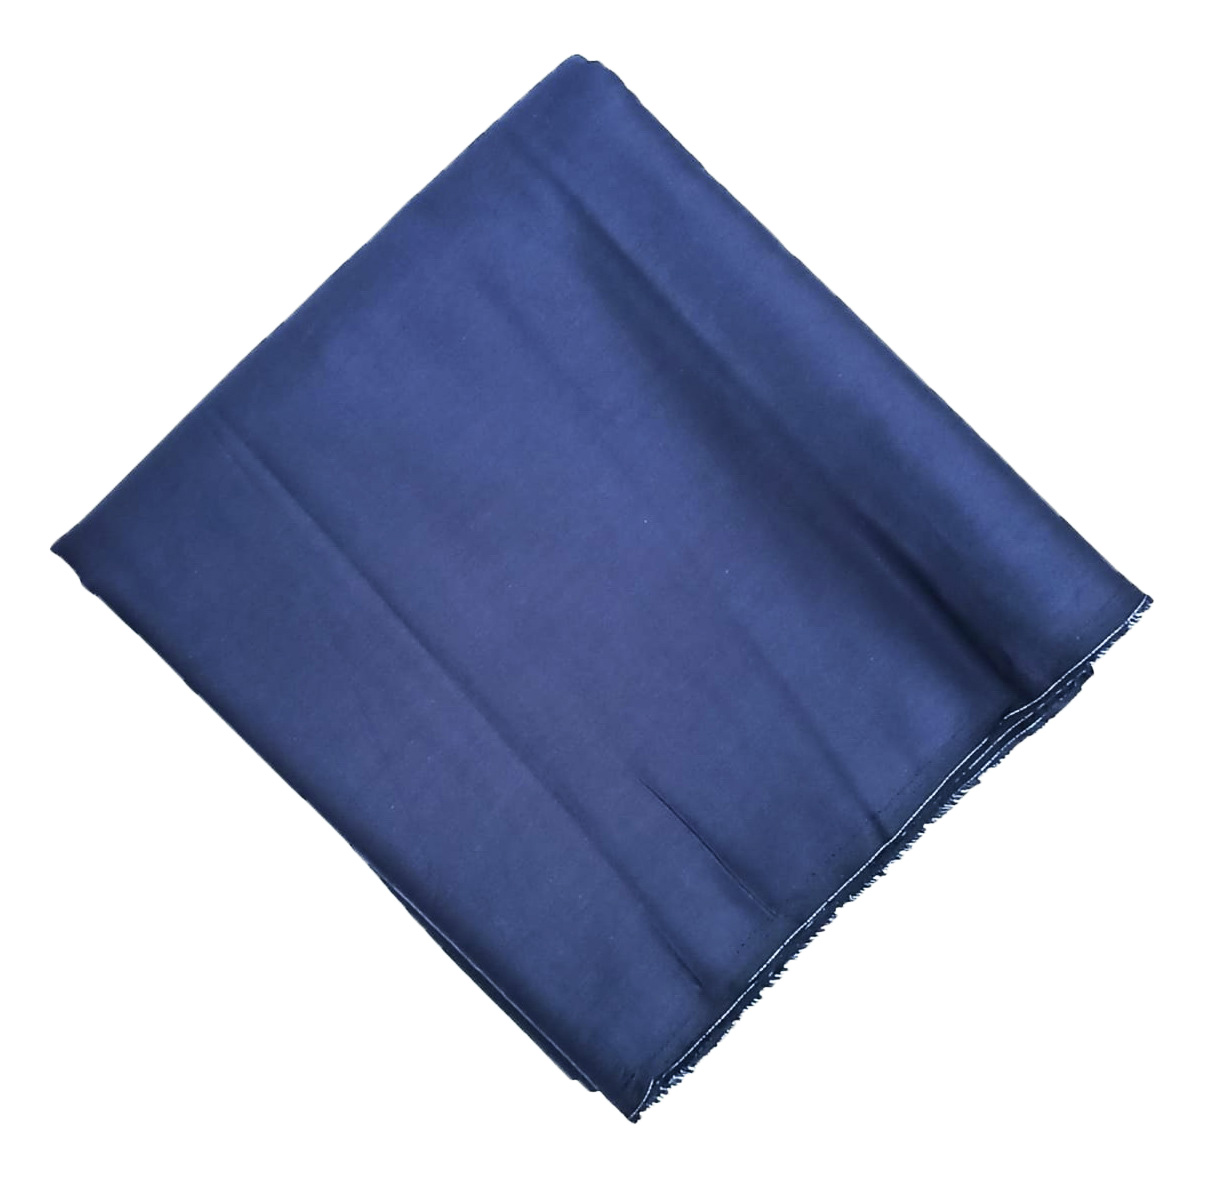 Navy Blue Makhani Cotton Fabric Cutpiece CJ049 1